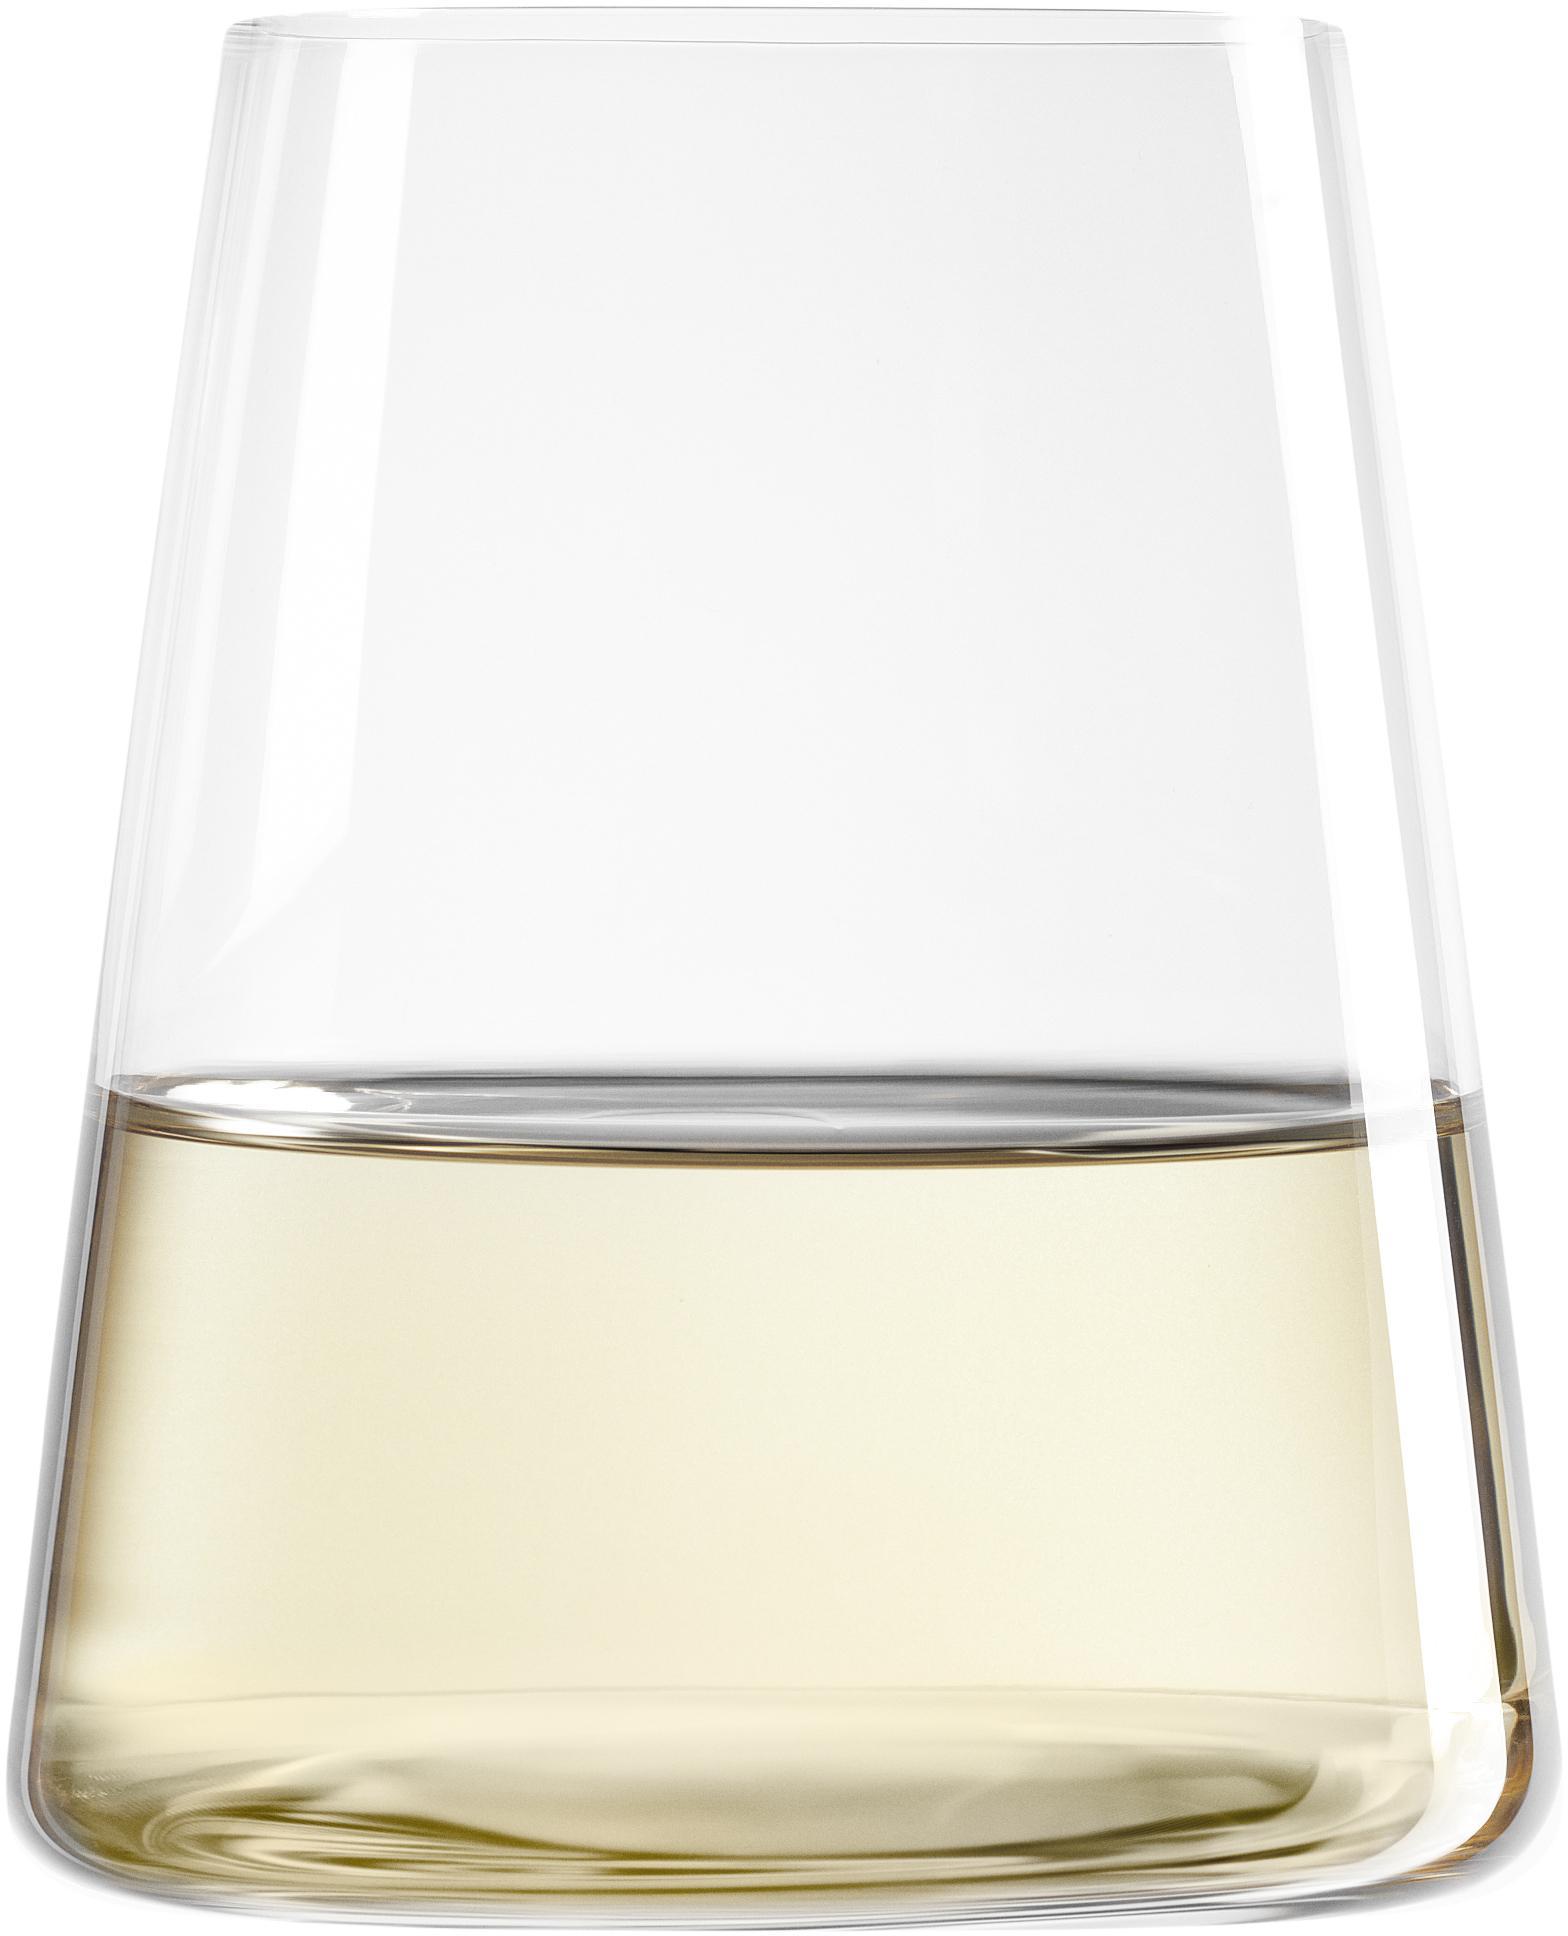 Vasos de cristal Power, 6uds., Cristal, Transparente, Ø 9 x Al 10 cm